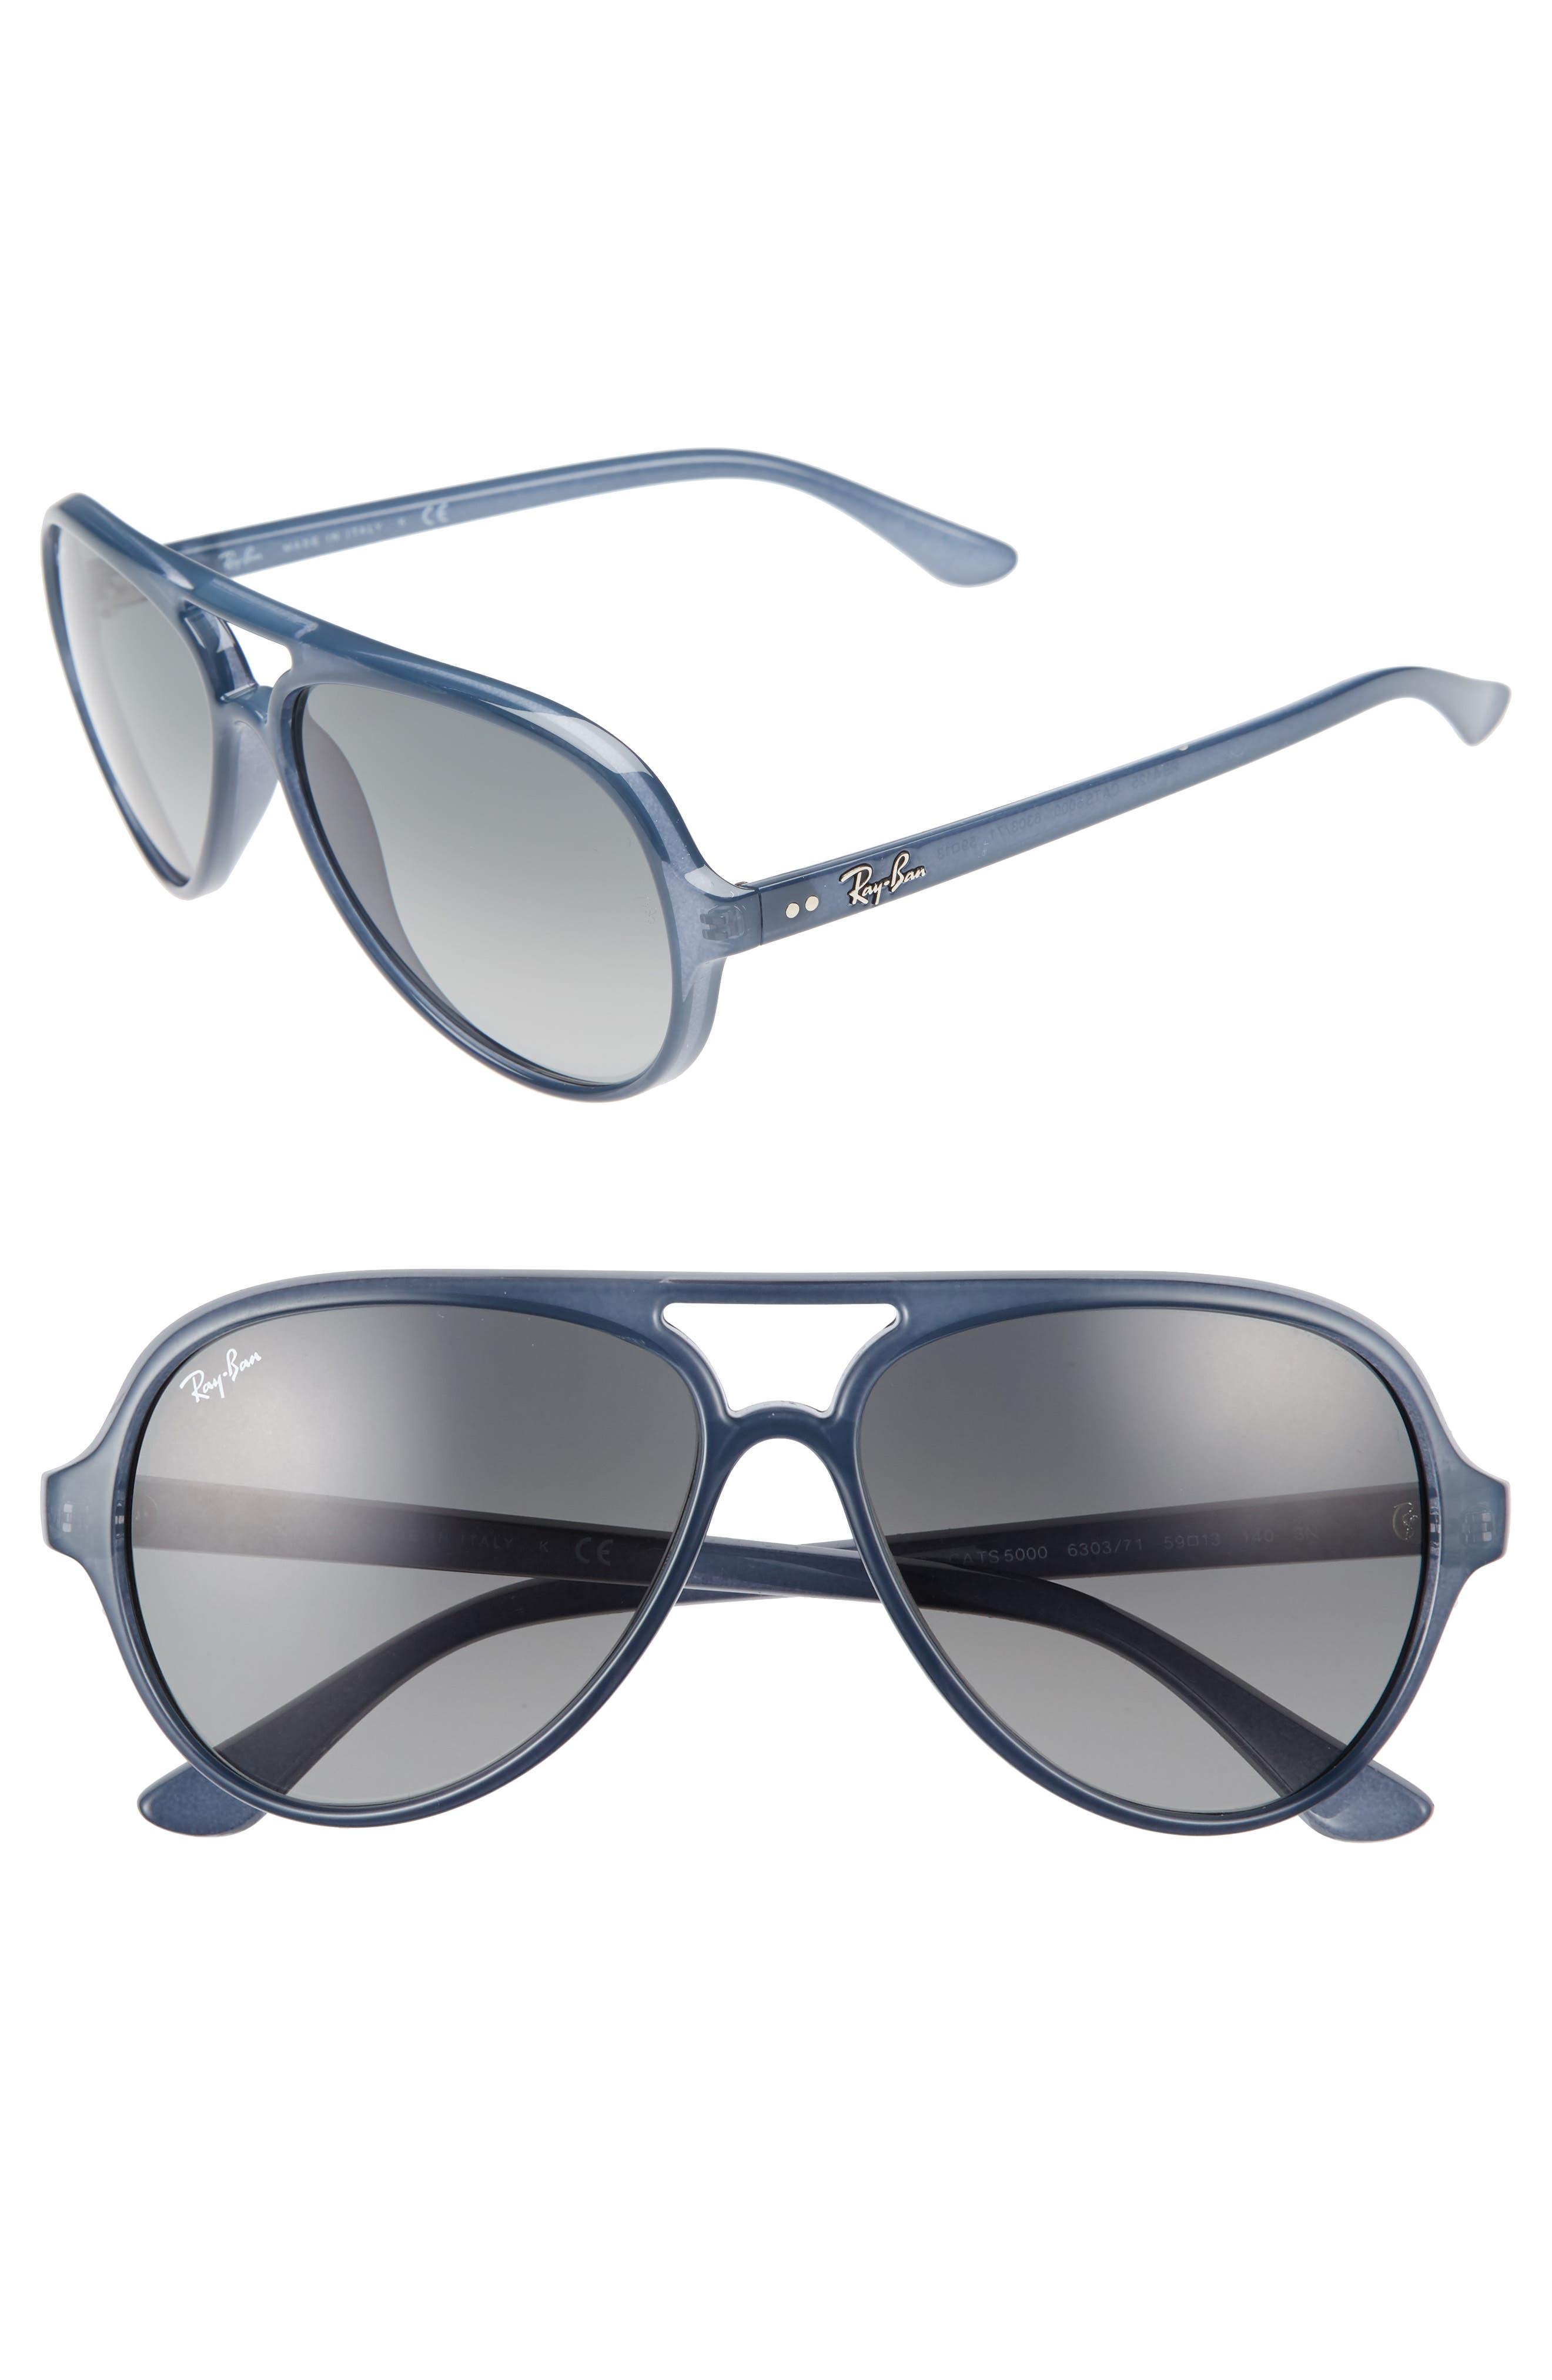 Ray-Ban 59mm Resin Aviator Sunglasses